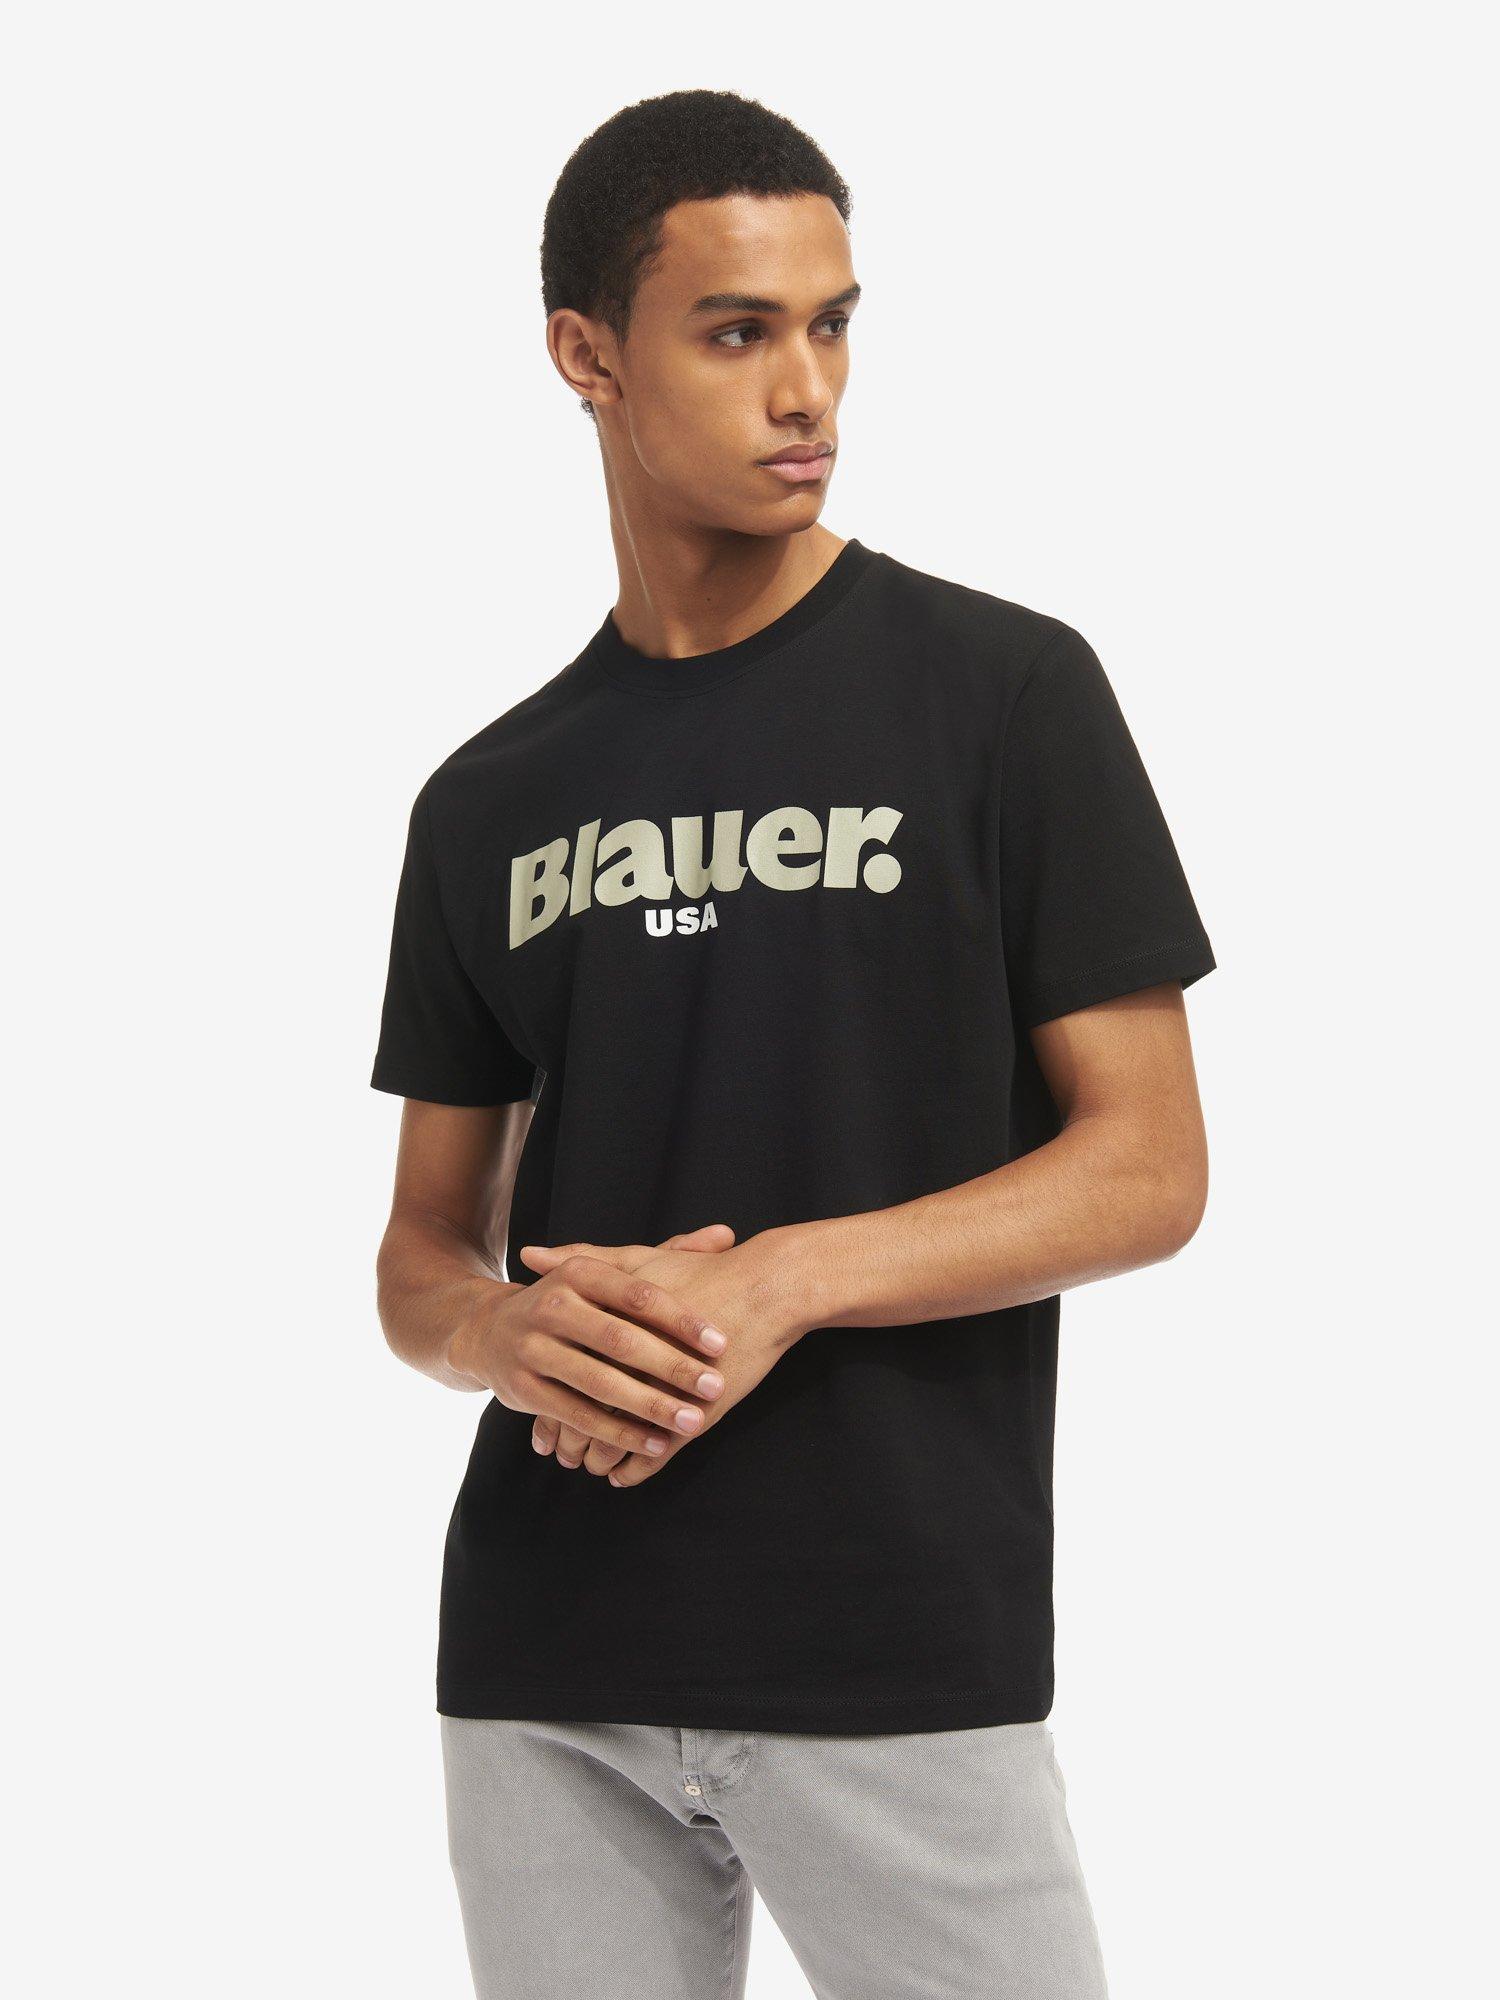 BLAUER USA T-SHIRT - Blauer